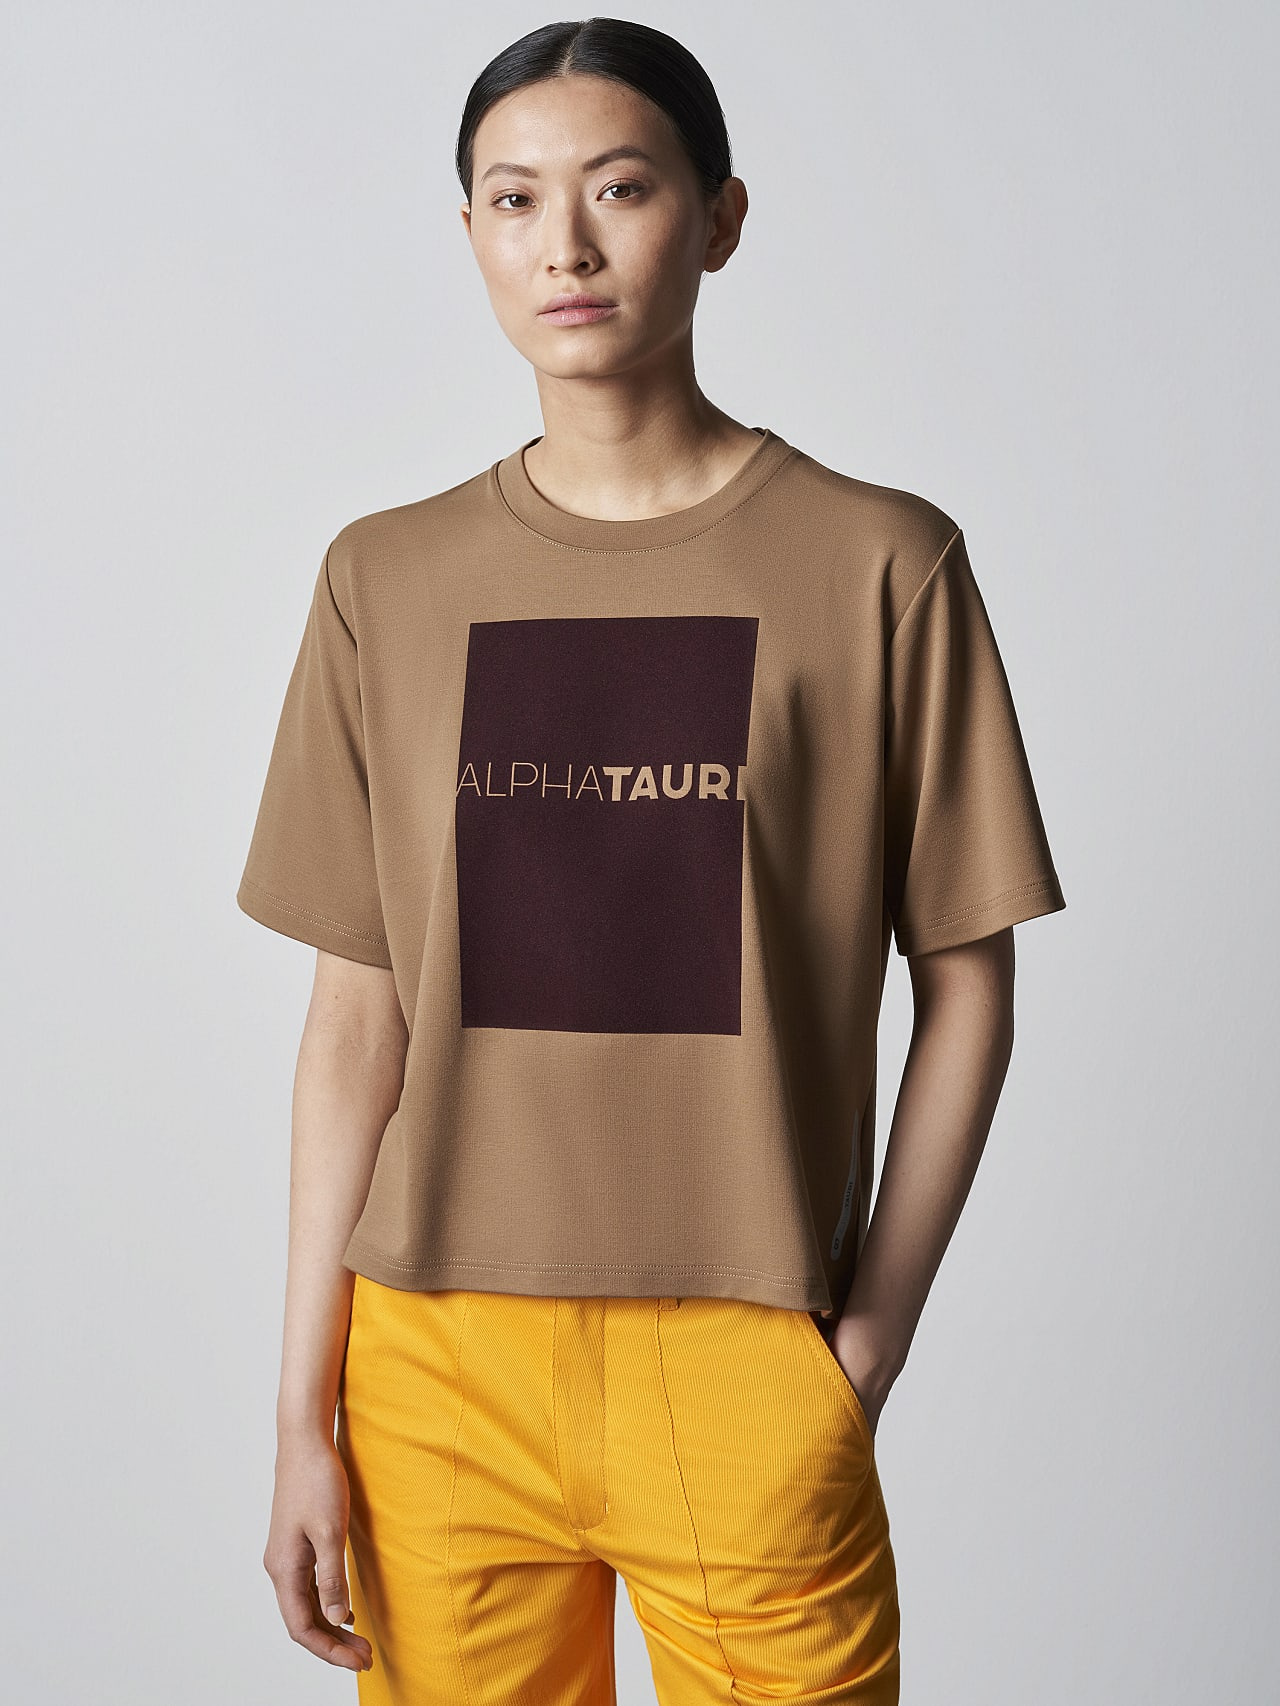 JASHU V1.Y5.02 Heavy-Weight Logo T-Shirt gold Model shot Alpha Tauri